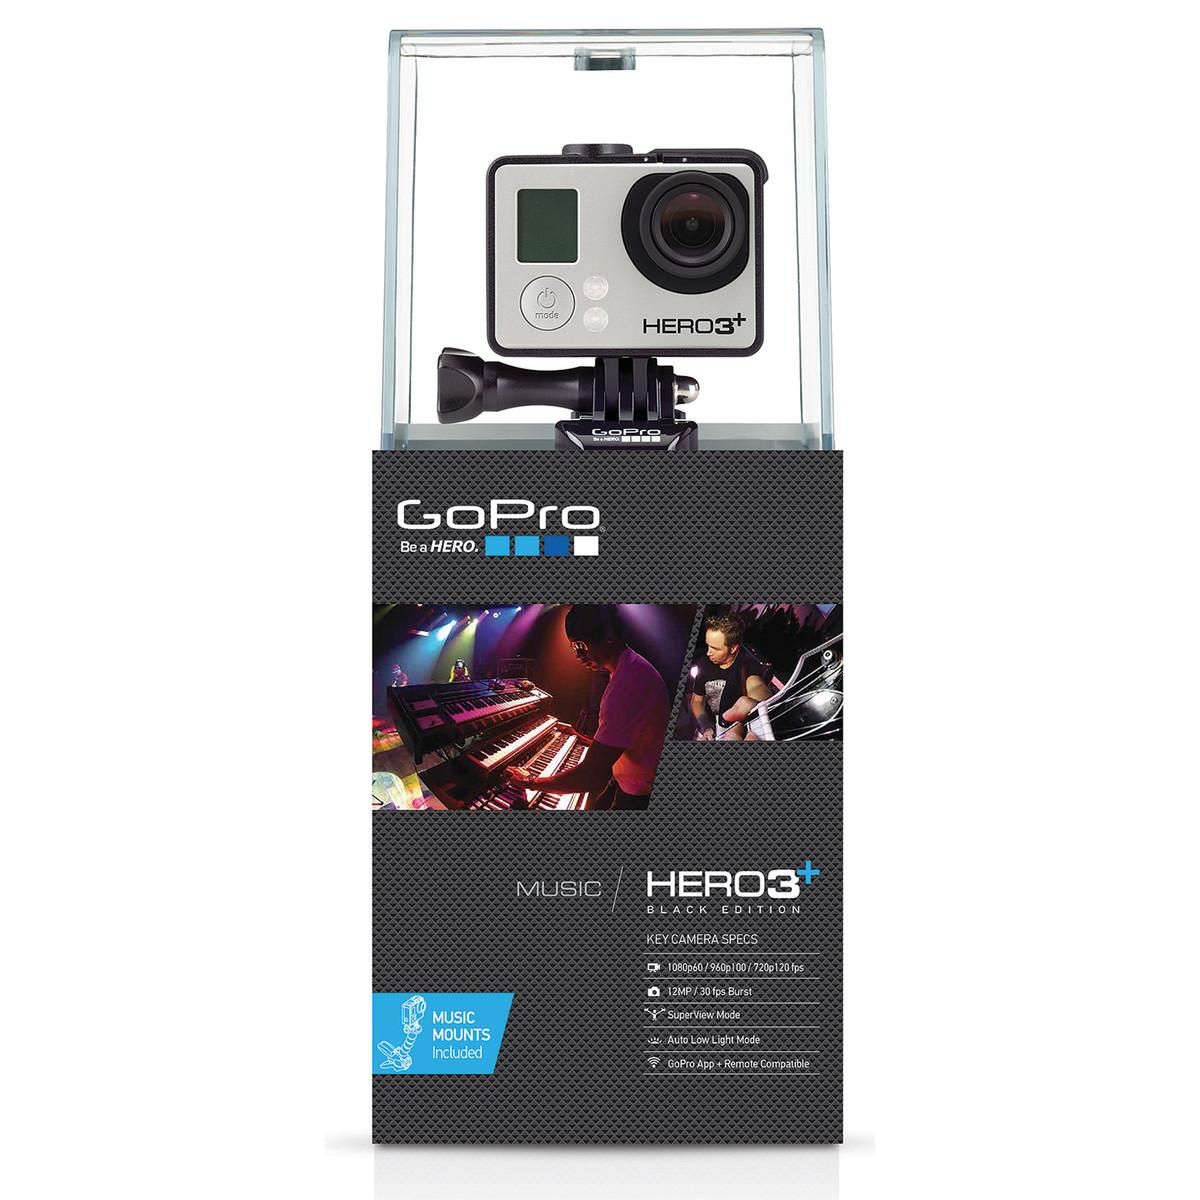 GoPro HERO3+ Black Music Edition Cámara de Vídeo en Gear4Music.com